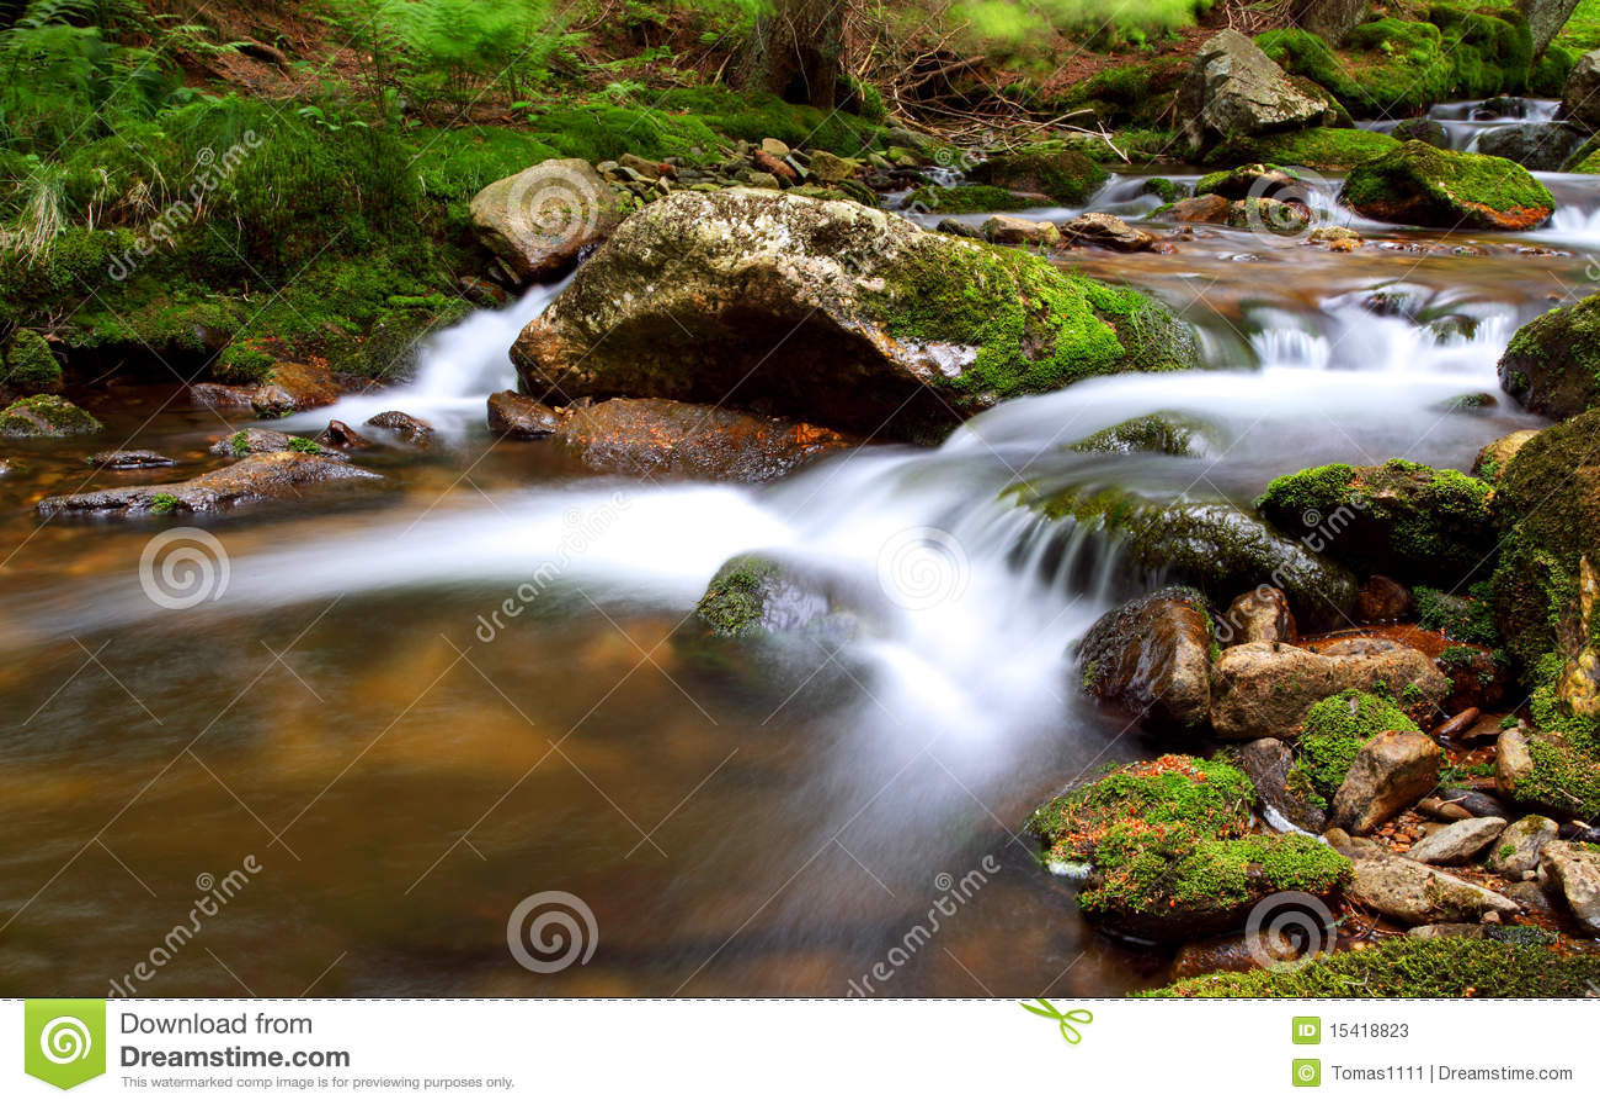 Nature Images 2mb: Motion Blur Waterfalls Peaceful Nature Stock Photos